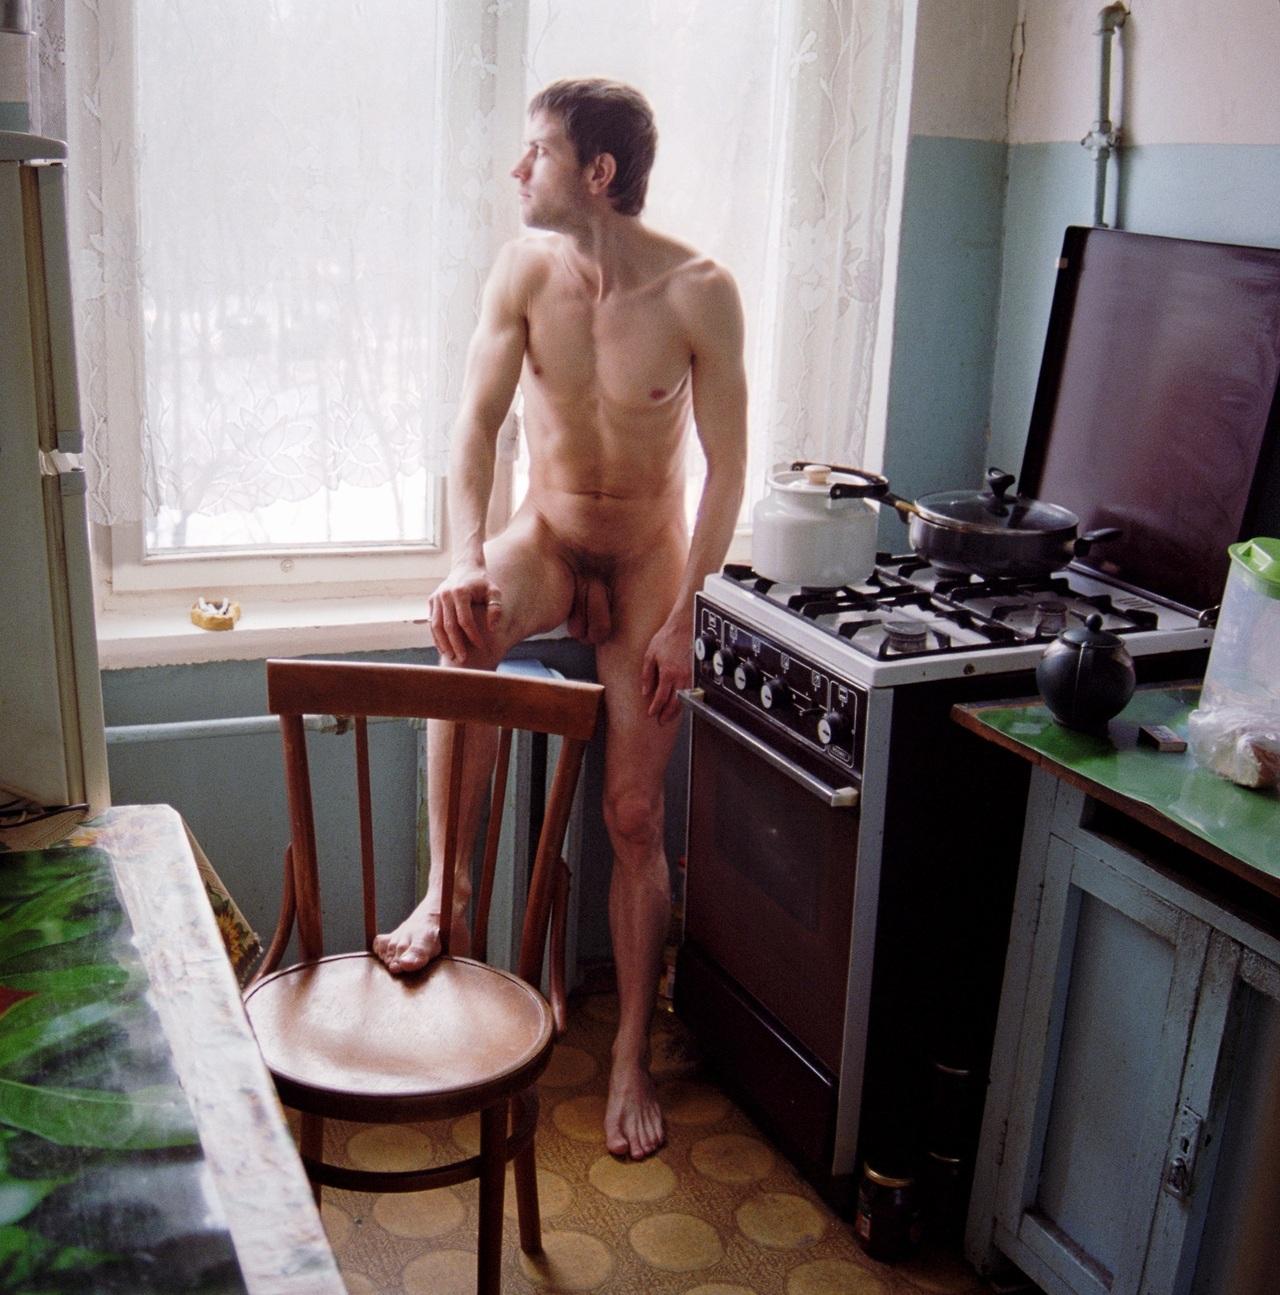 the naked kitchen photo